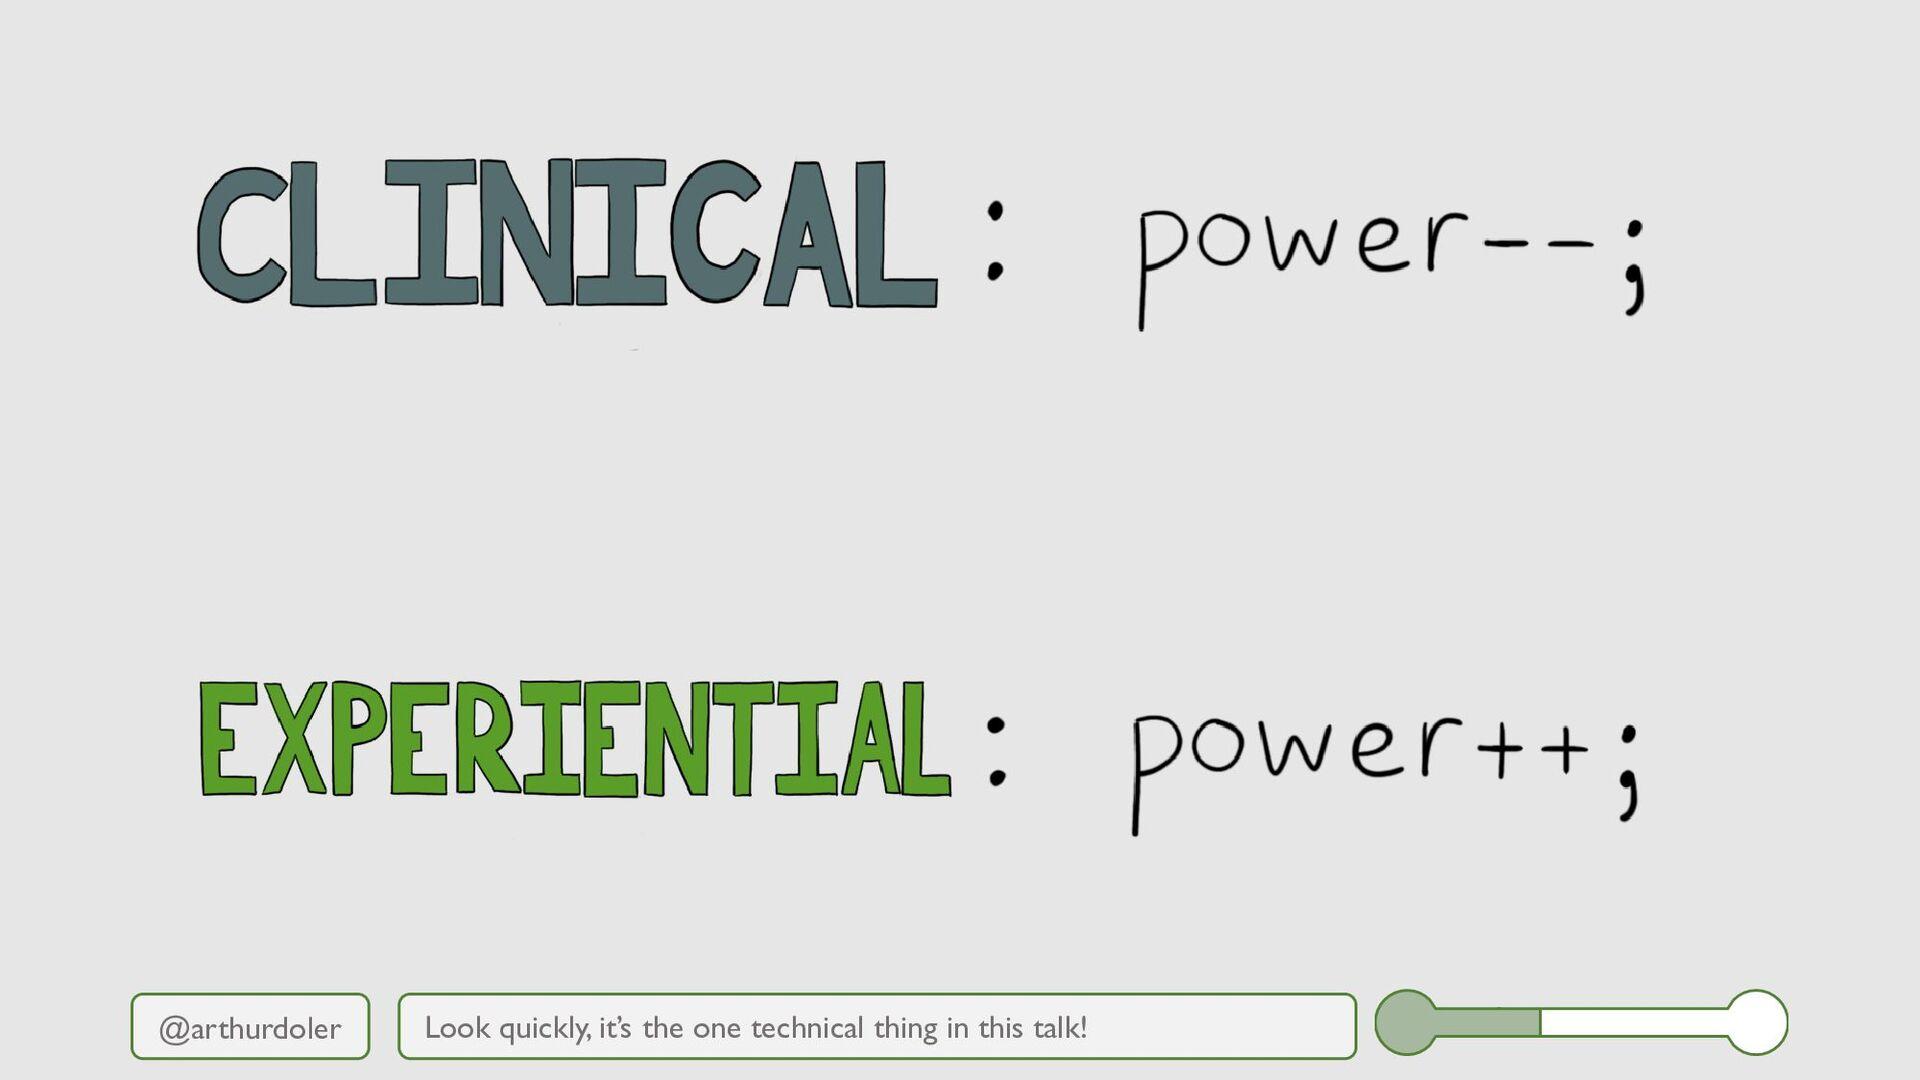 @arthurdoler Look quickly, it's the one technic...